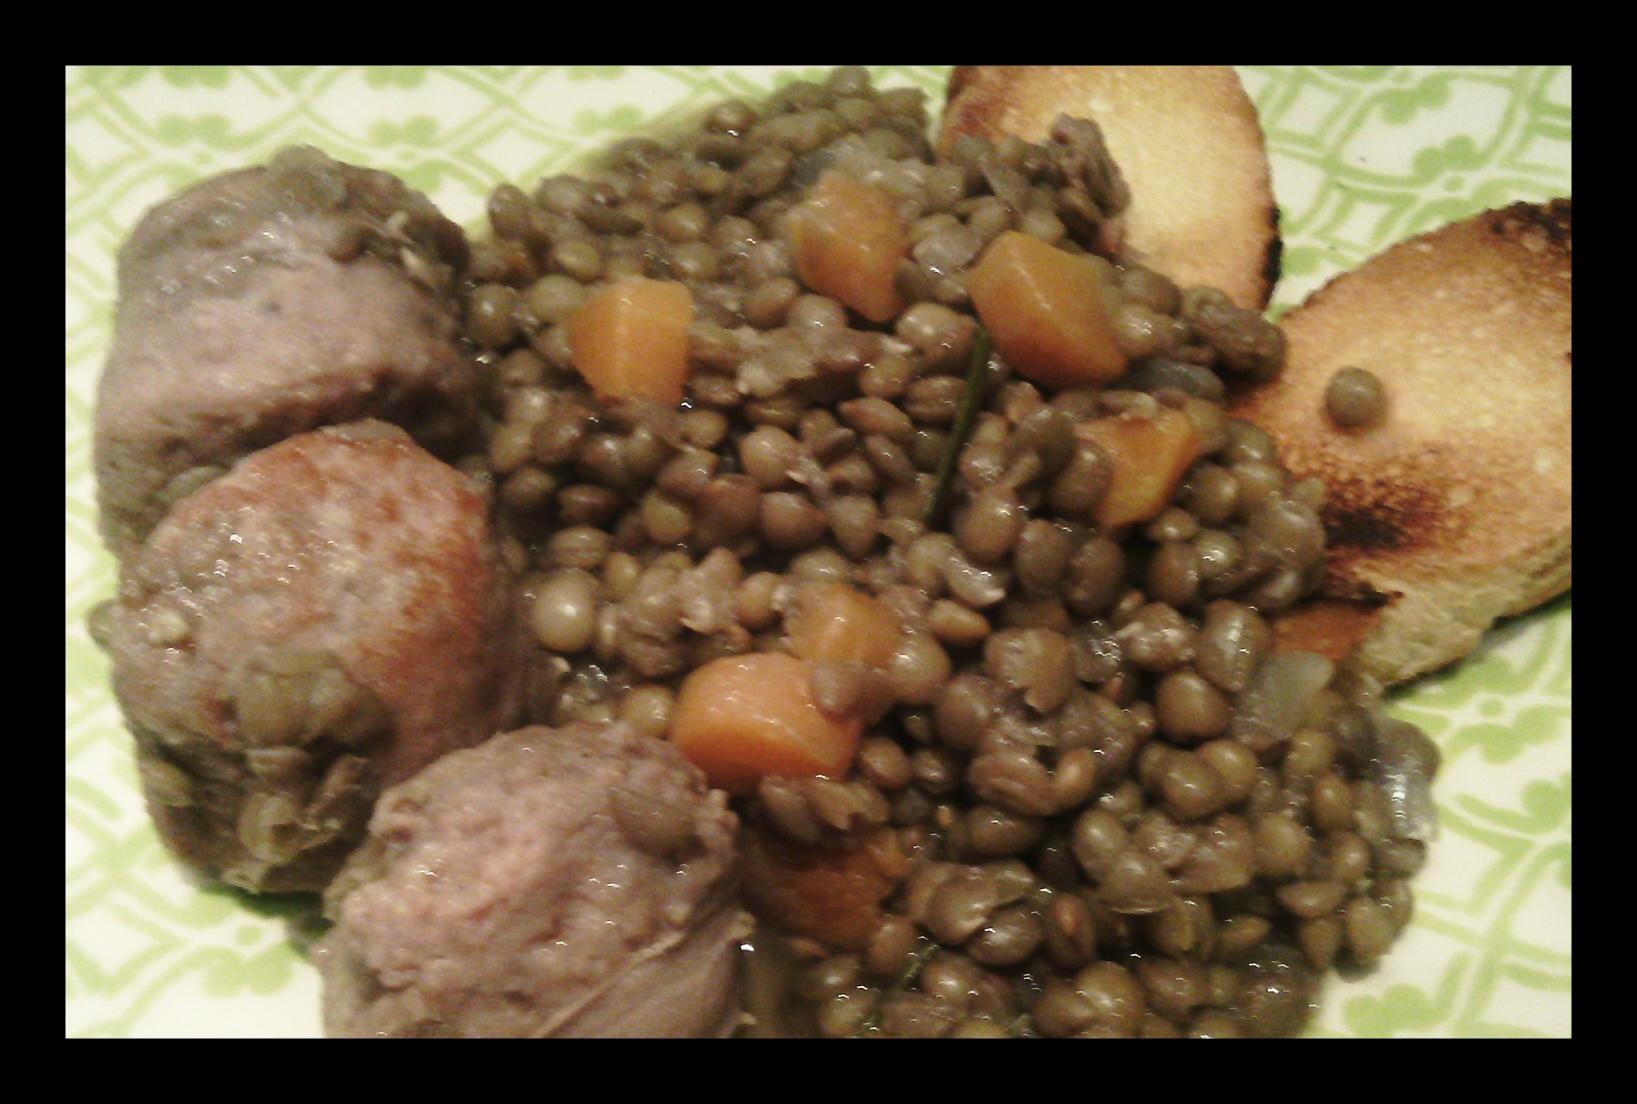 Lenticchie e salsiccia stufate